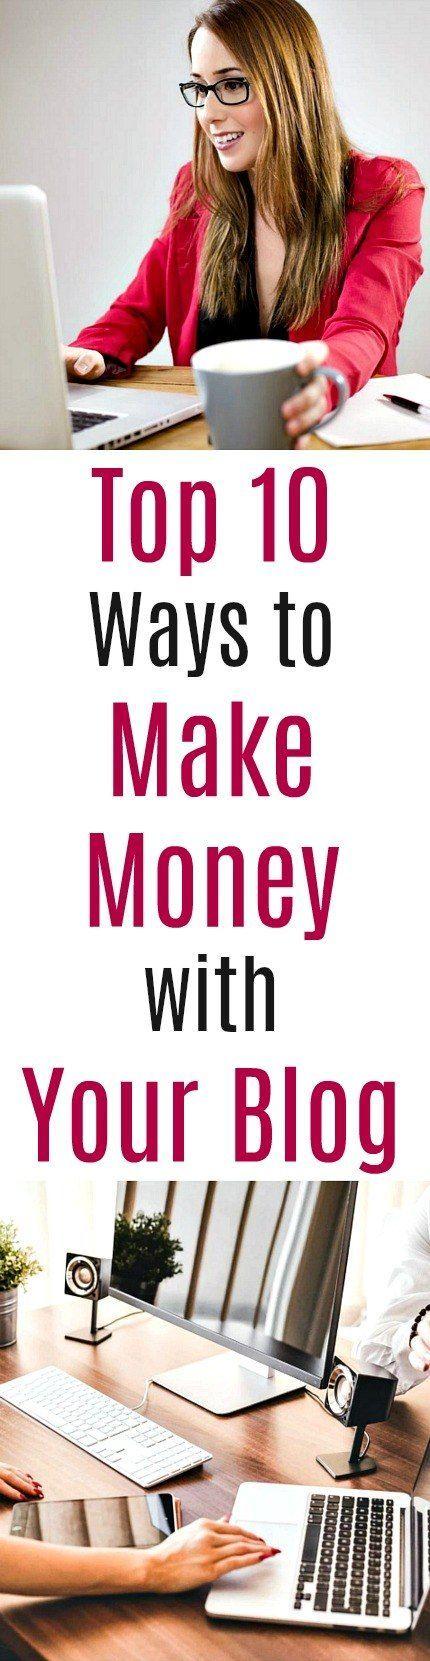 Top Ways To Make Money Online